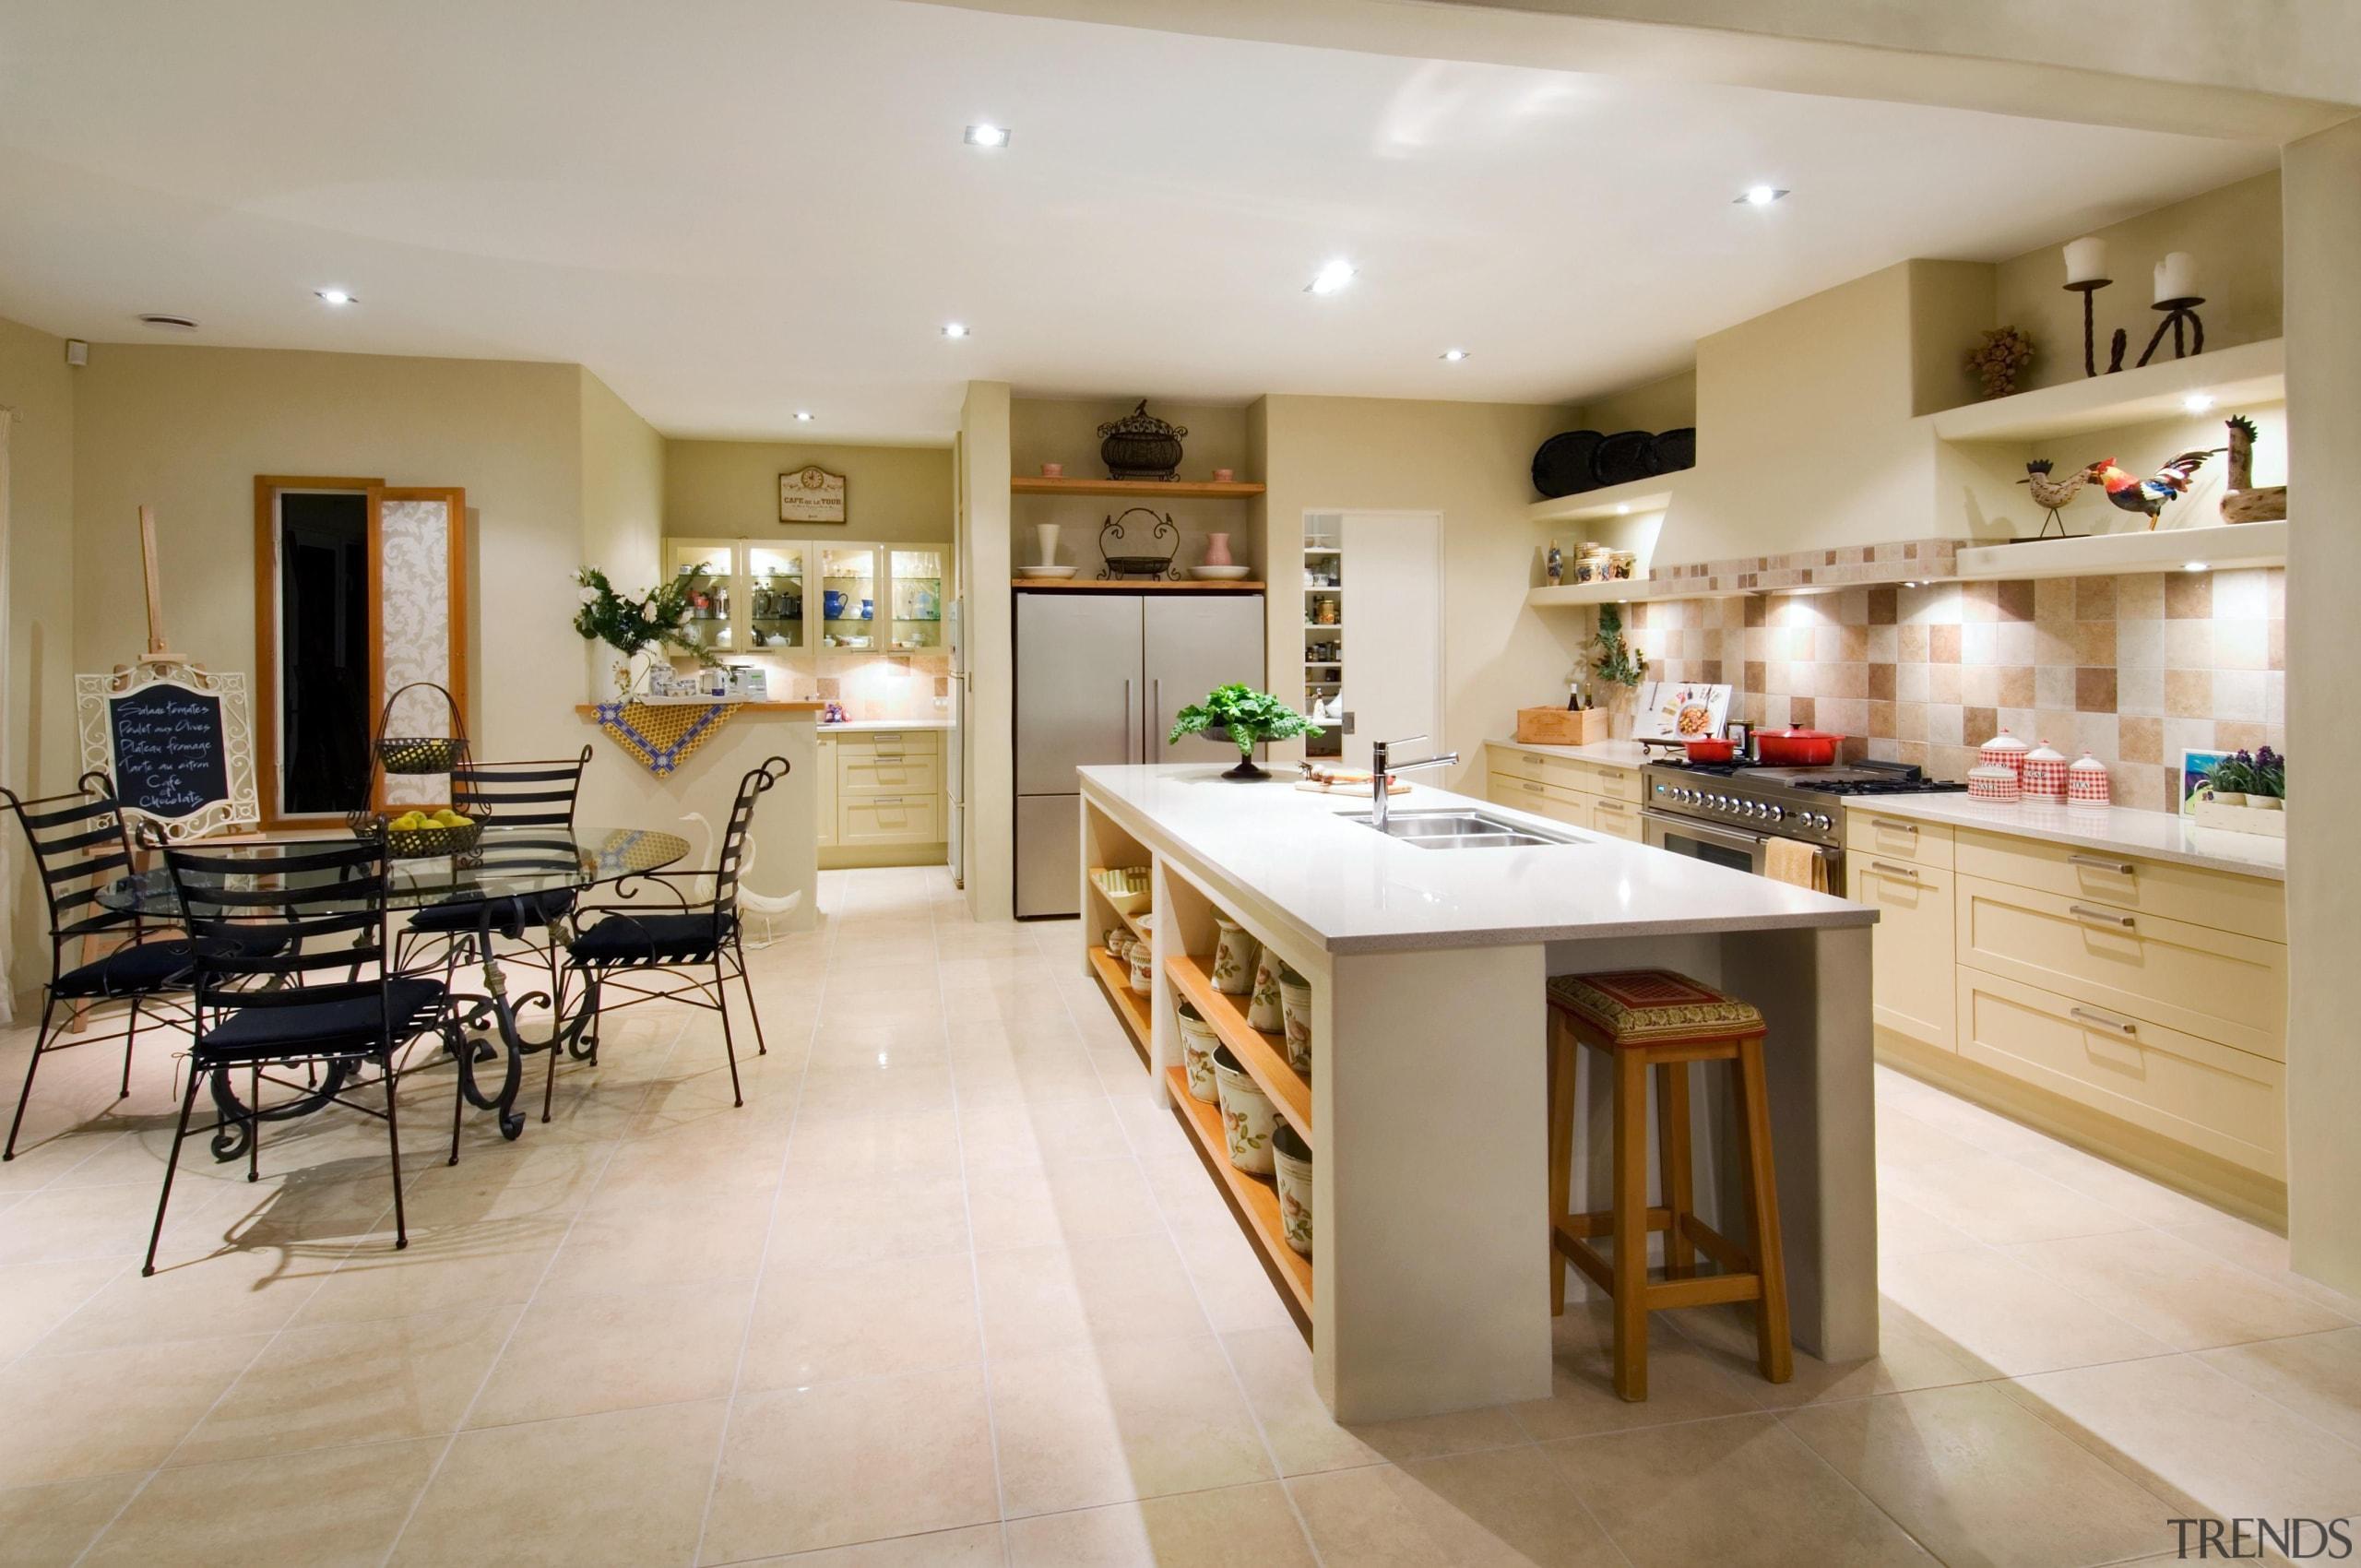 140 mahoenui 10 - Mahoenui 10 - countertop countertop, cuisine classique, interior design, kitchen, room, gray, brown